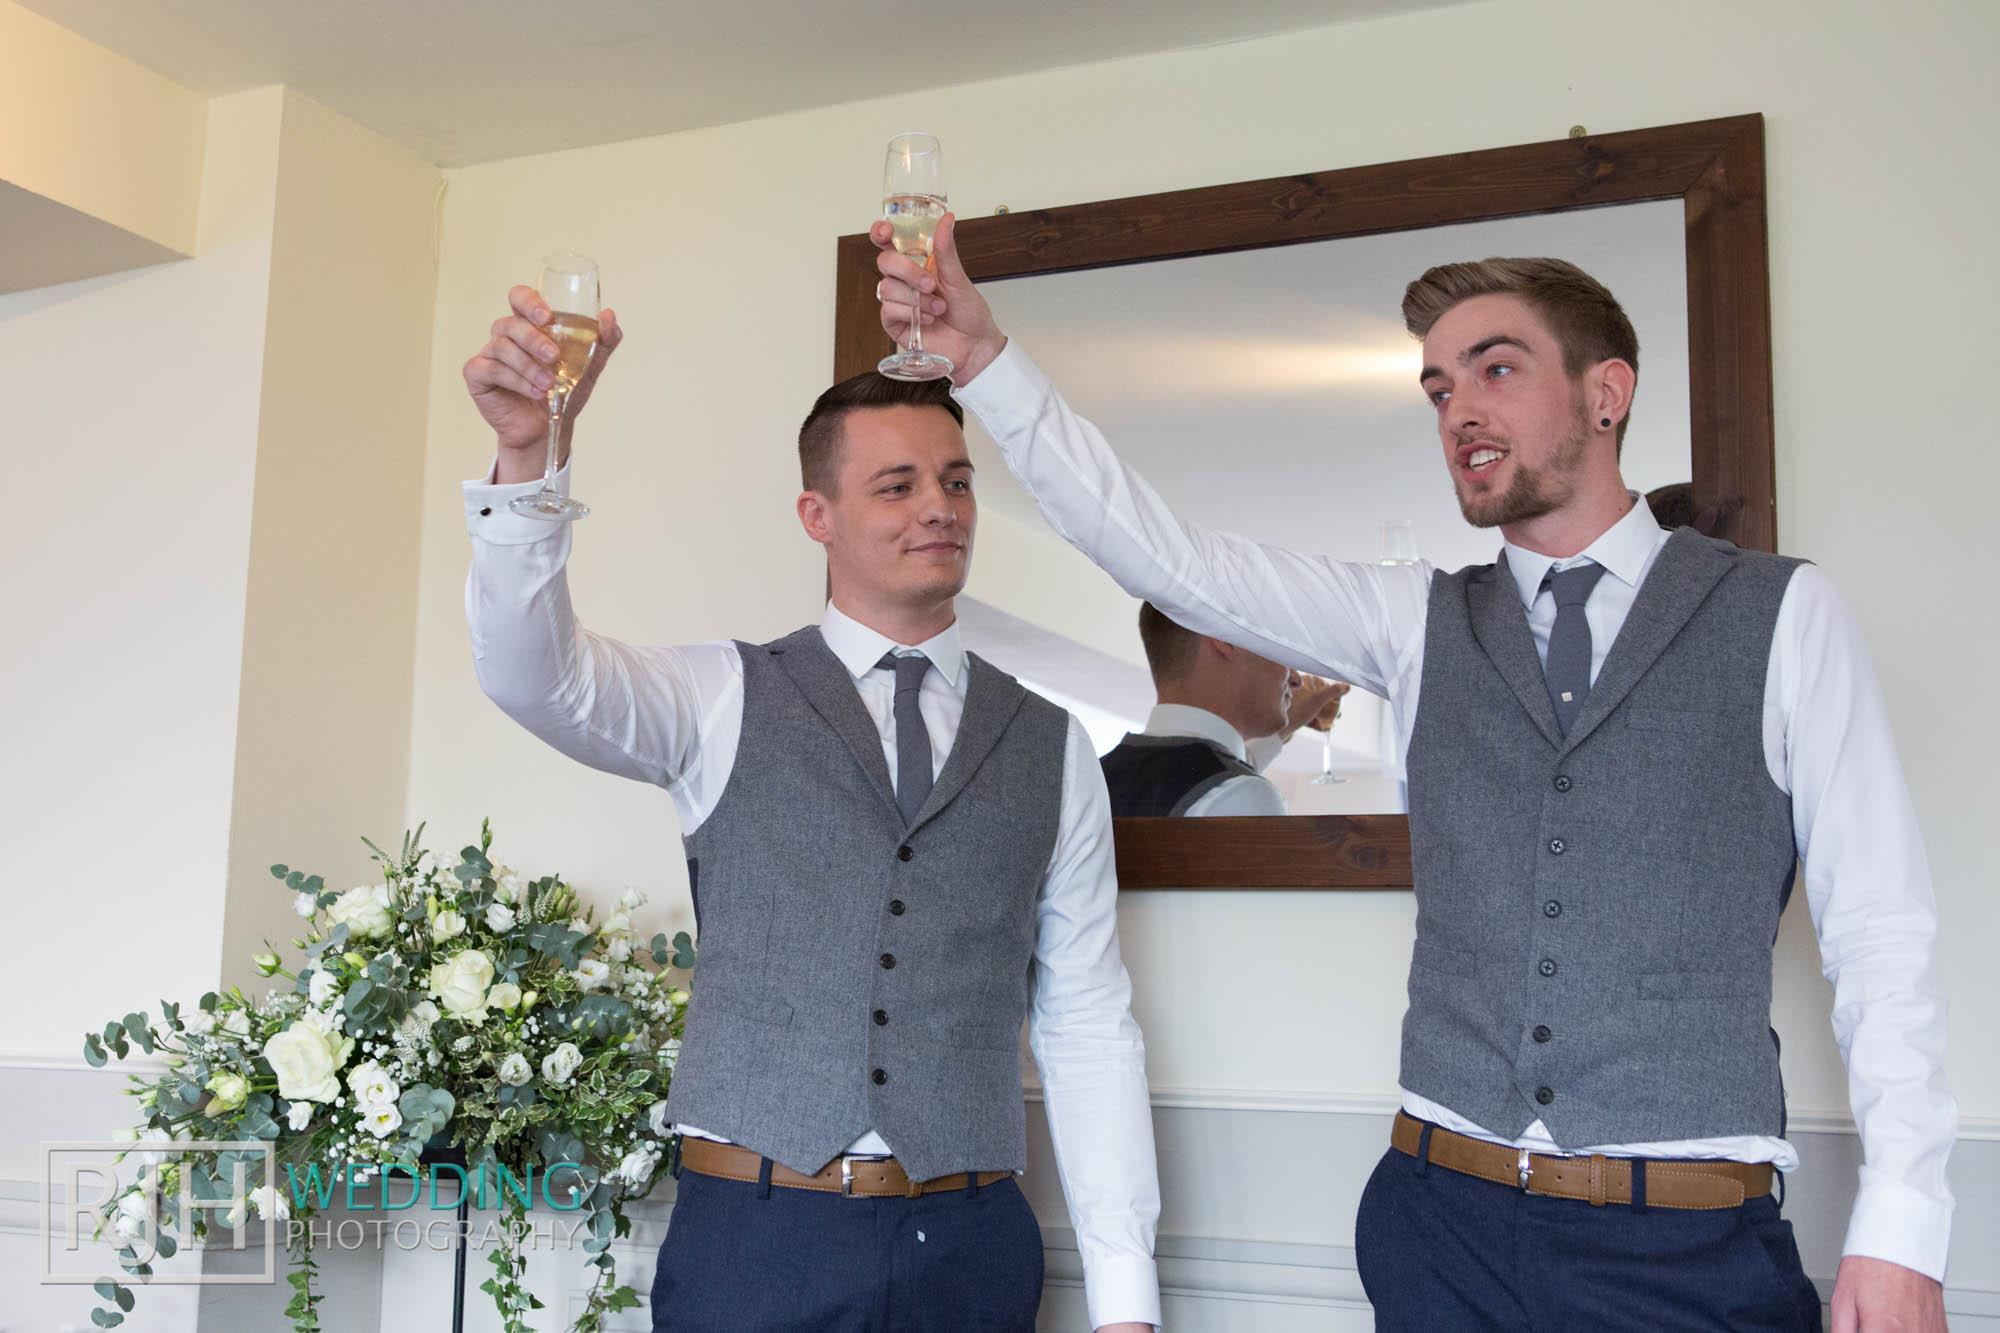 Whitley Hall Marples Wedding_378_3C2A9301.jpg